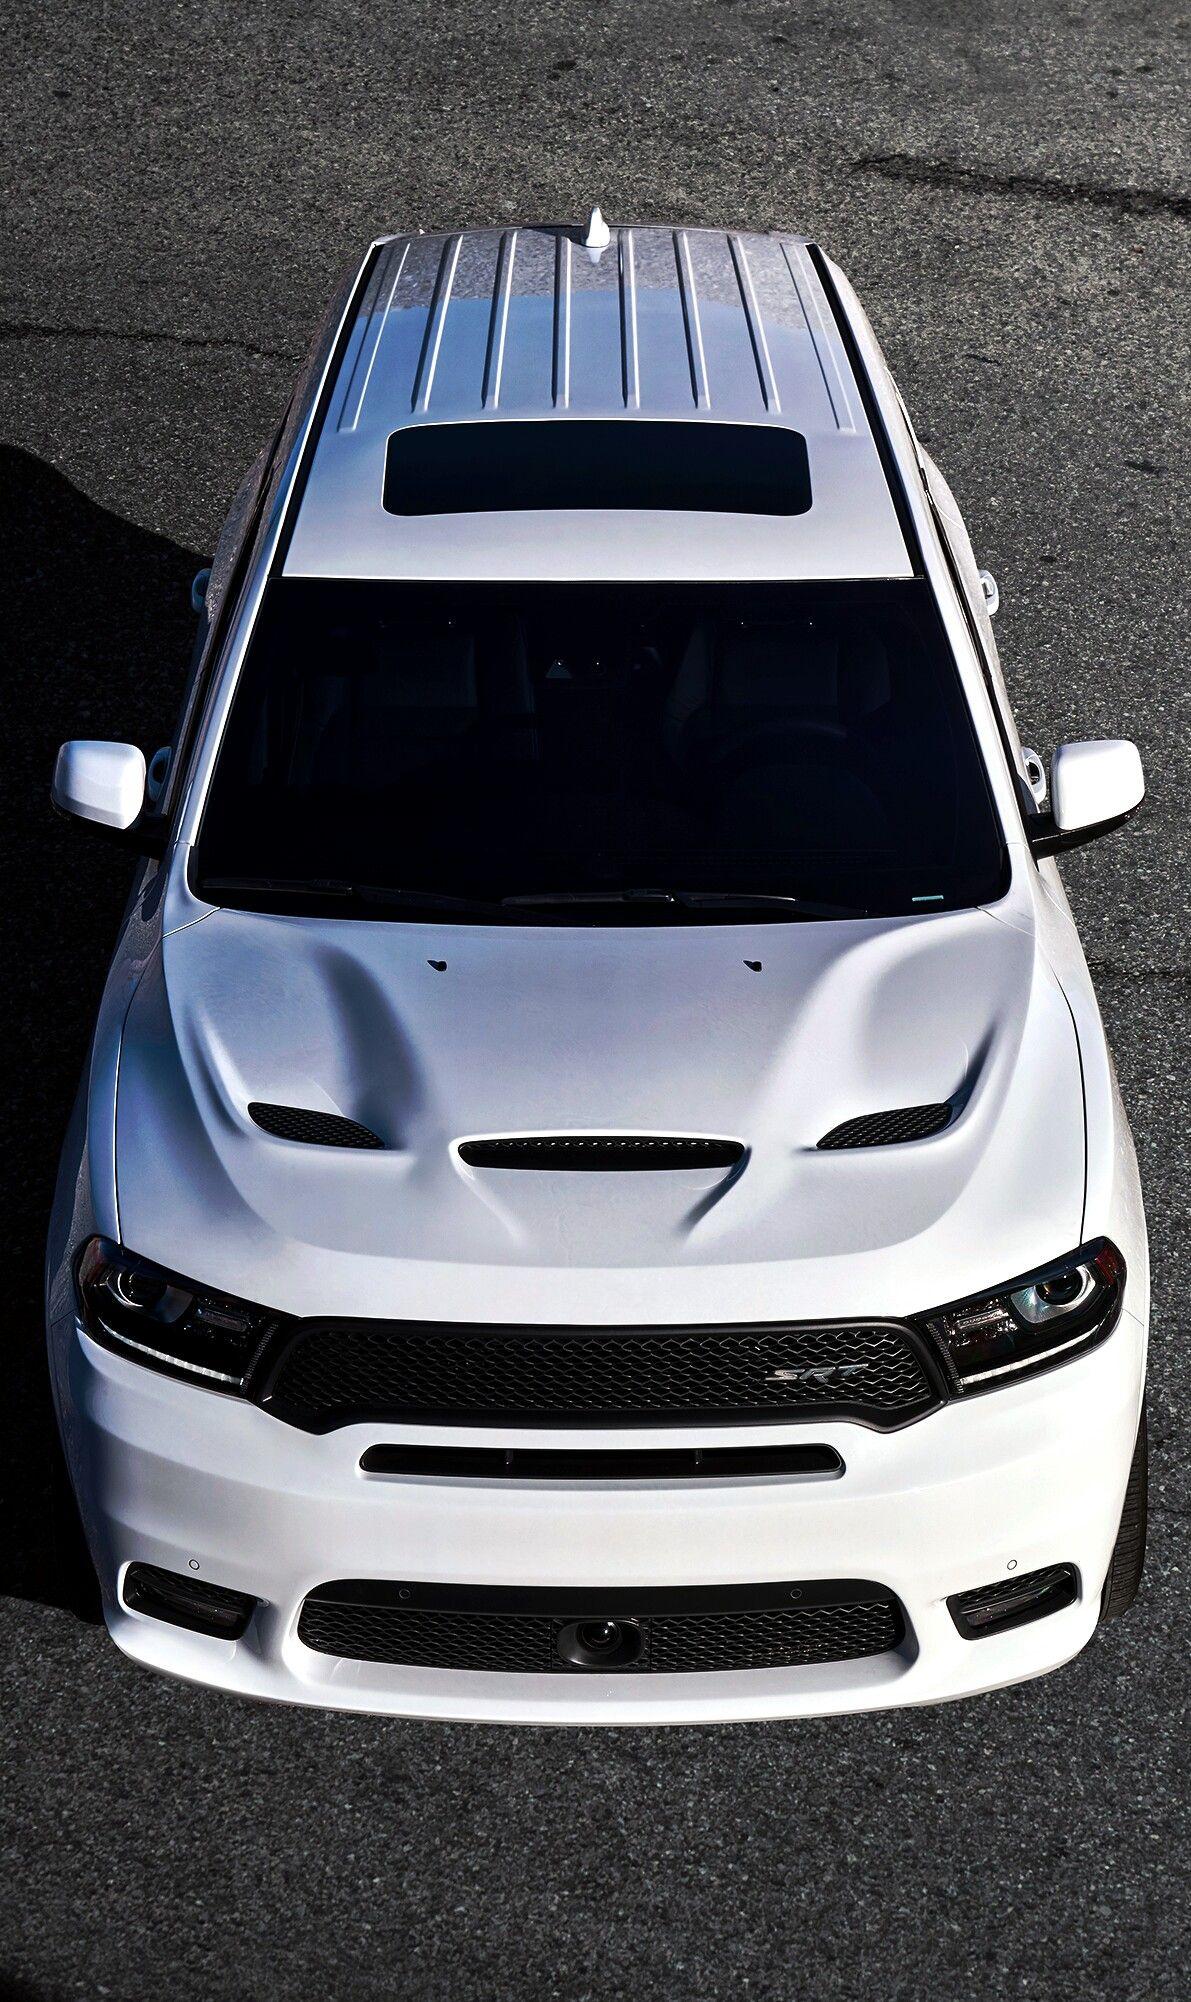 Dodge Durango Srt Hemi Put A Dodge In Your Garage Enhanced By